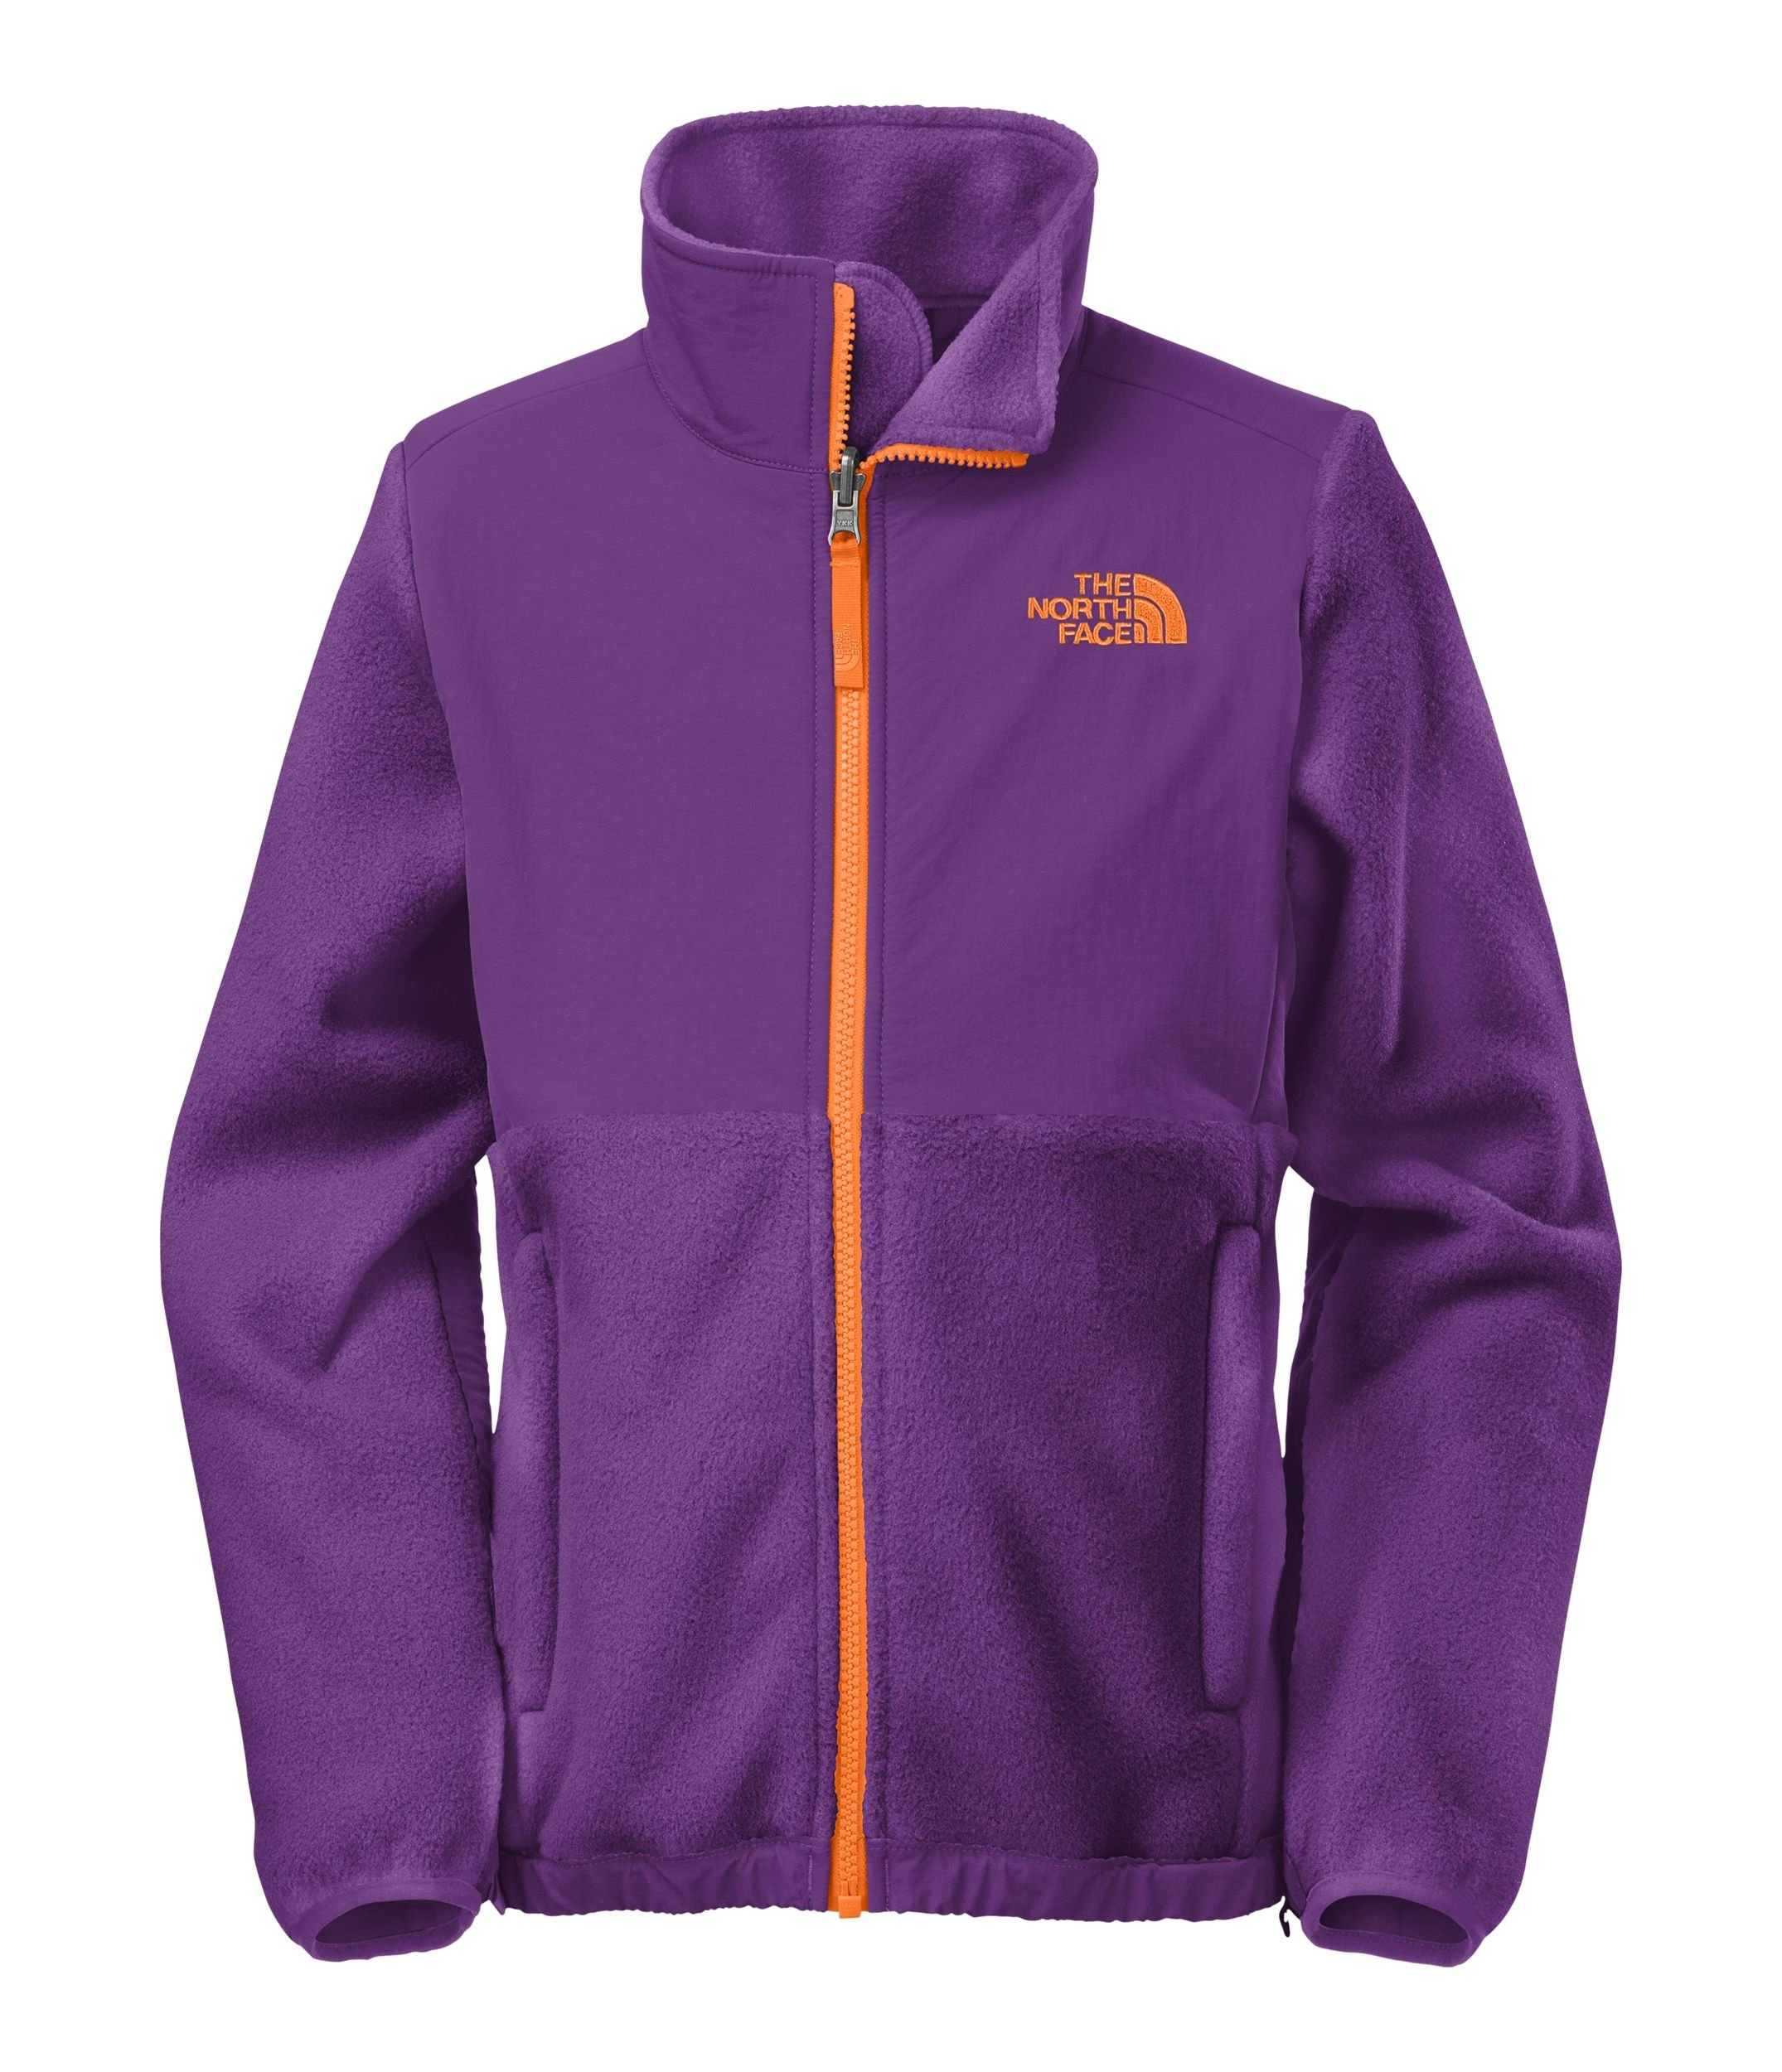 North Face Denali Jacket Big Kids Style : Cdb5